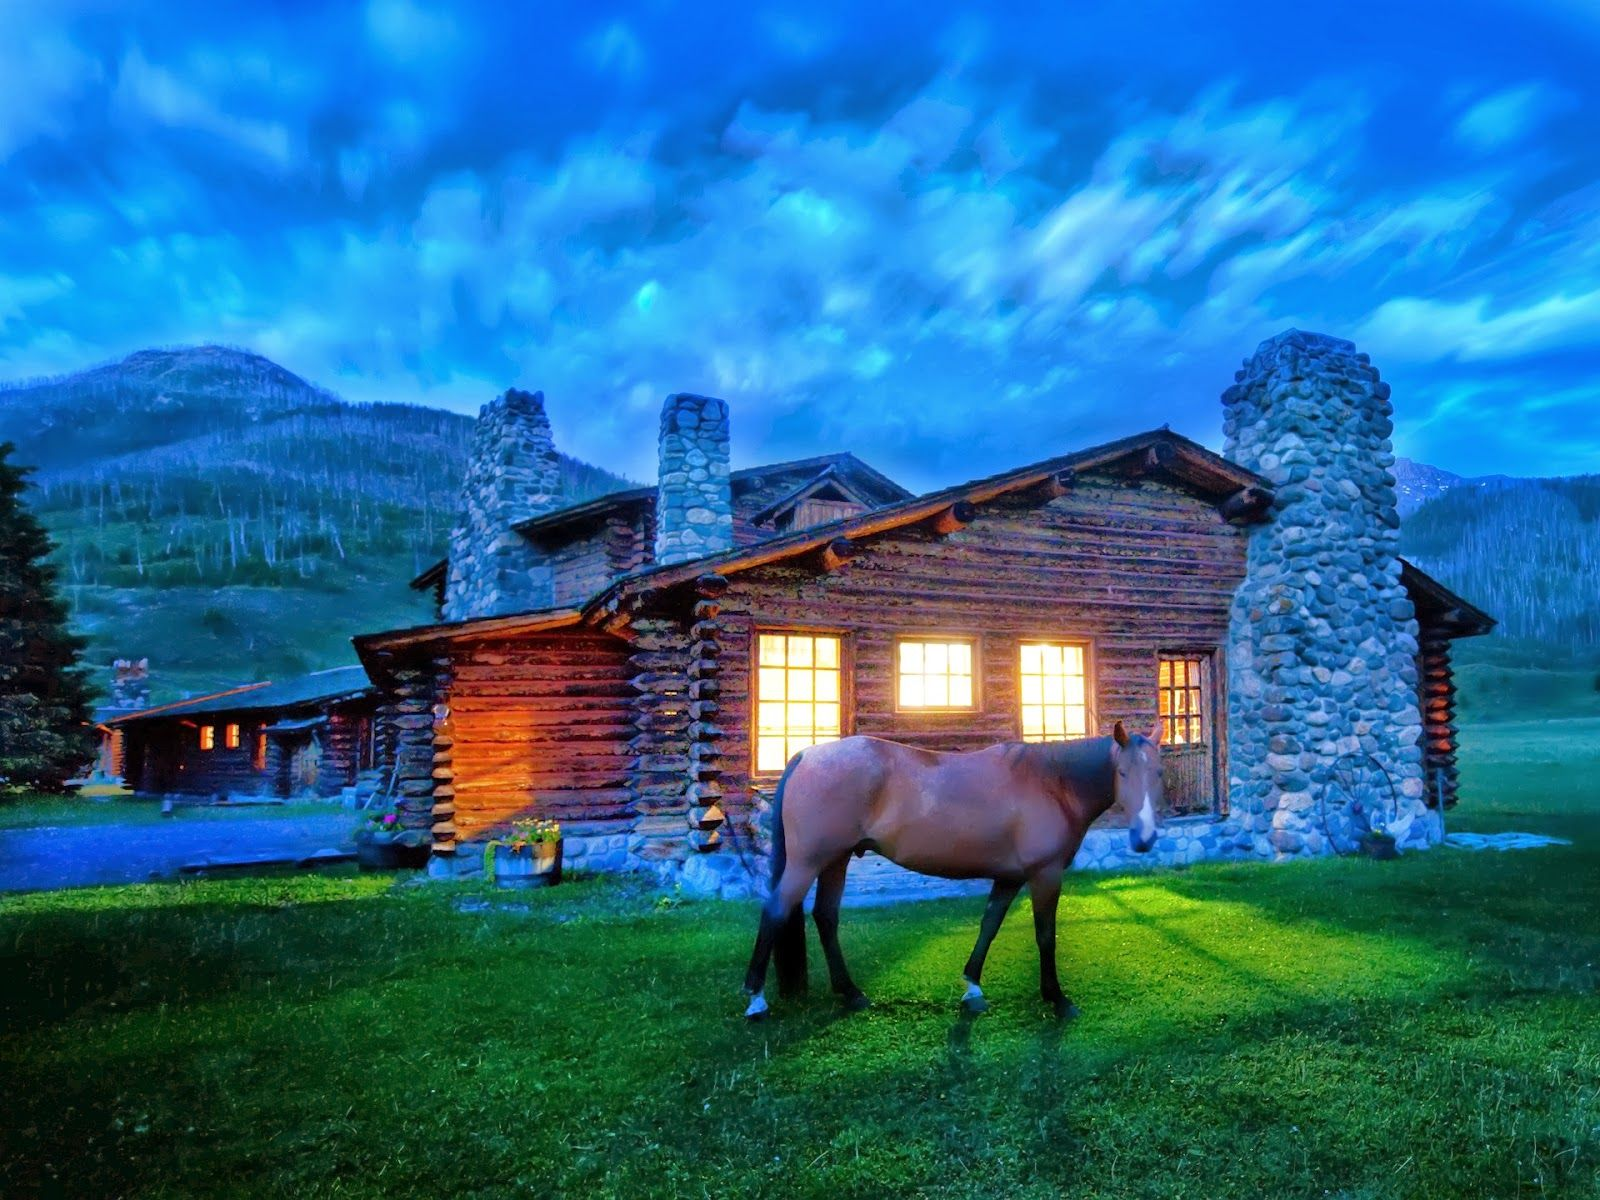 Must see Wallpaper Horse Scenery - 0dba78f921832c68731c0d56a9136b3f  Photograph_783975.jpg